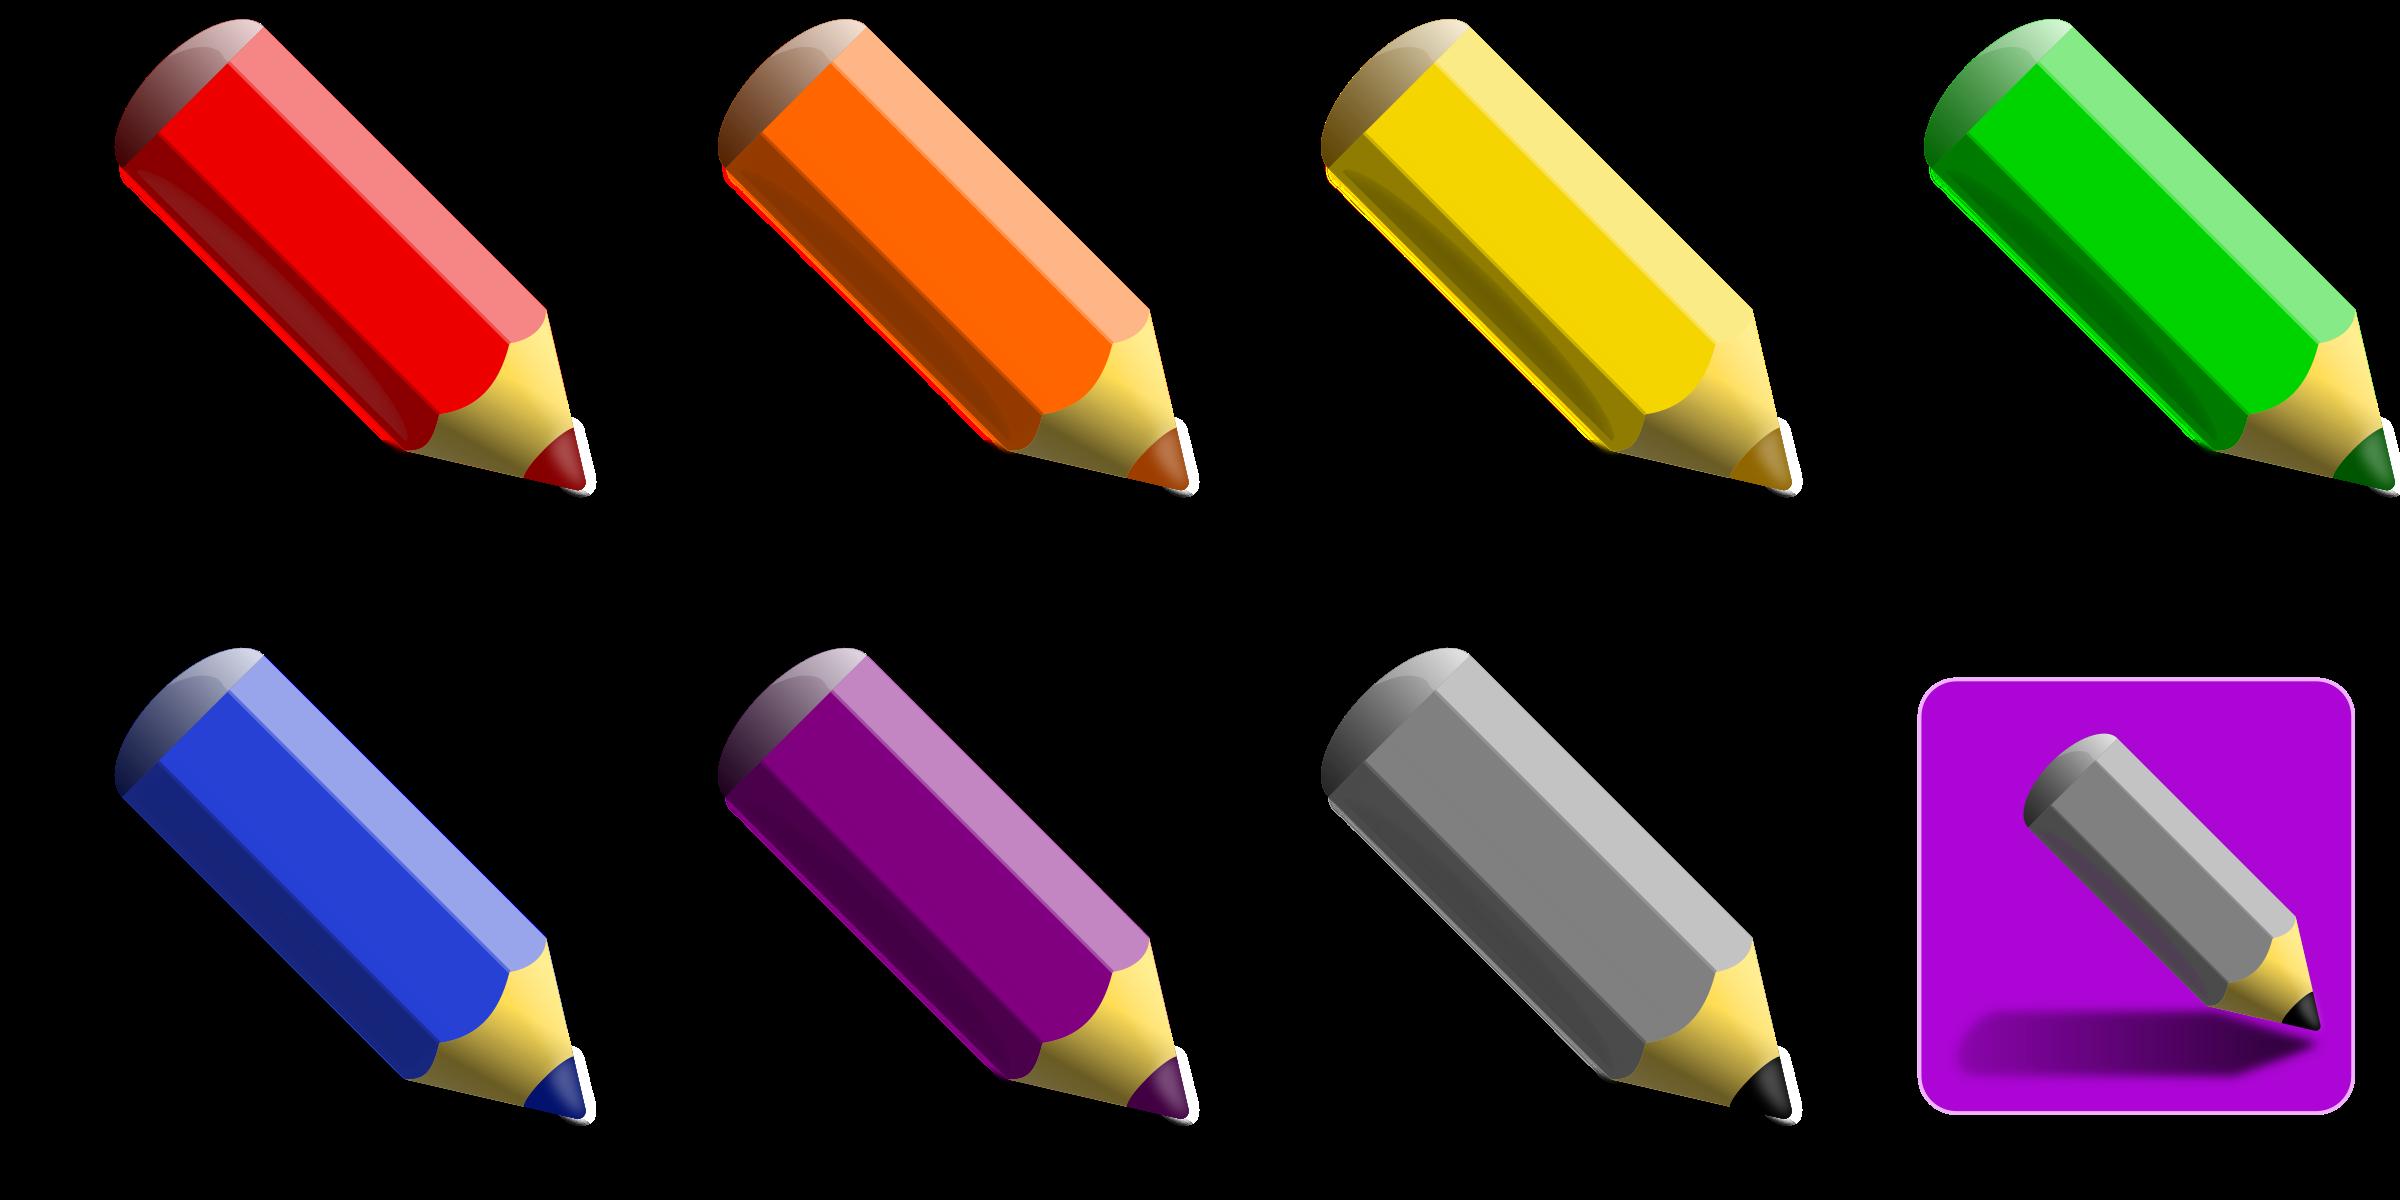 2400x1200 7 Color Pencils Icons Png